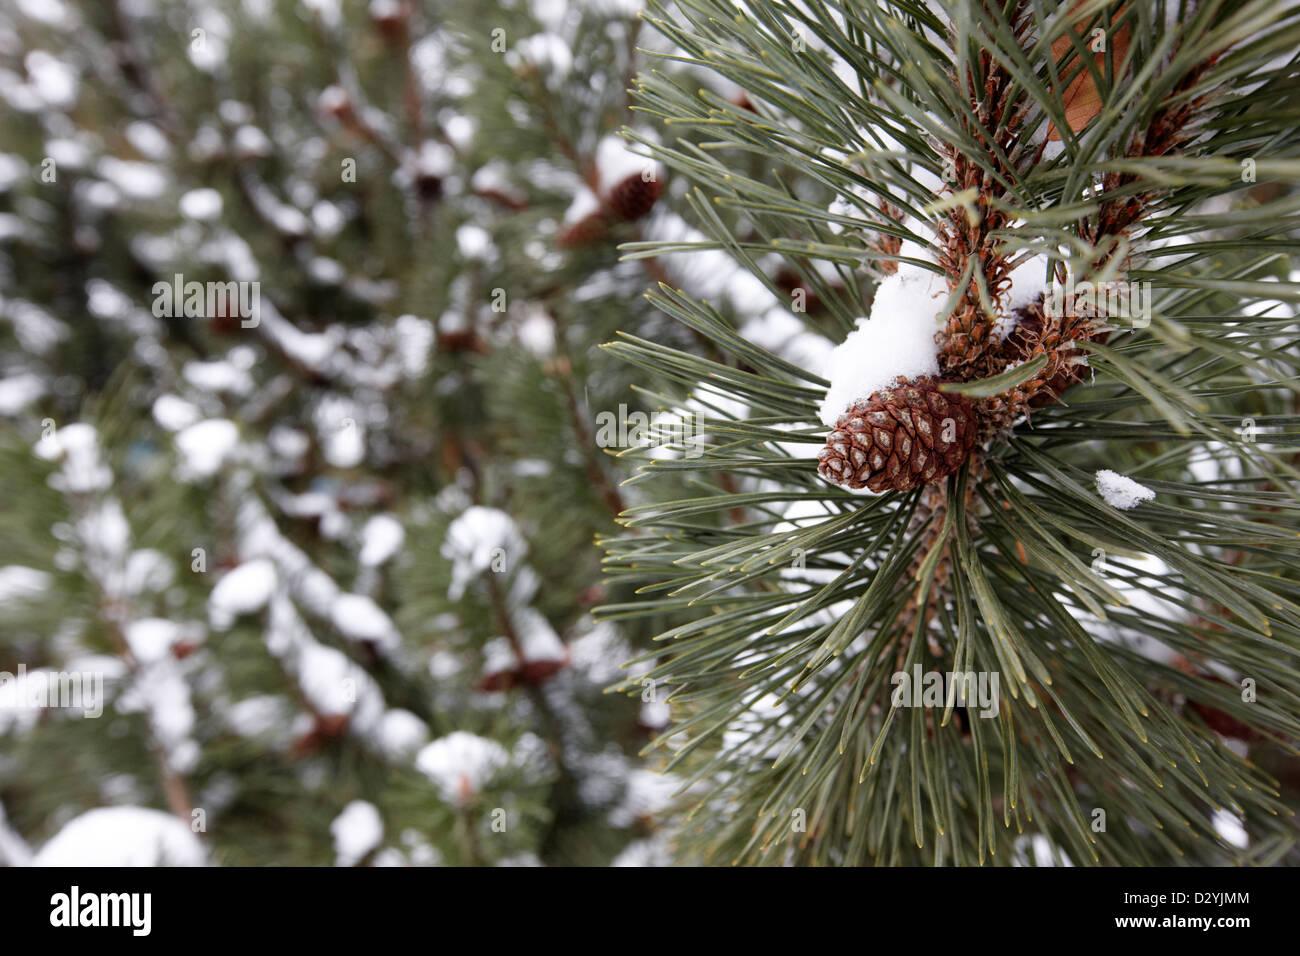 pine cones growing on fir trees in the snow Saskatoon Saskatchewan Canada - Stock Image